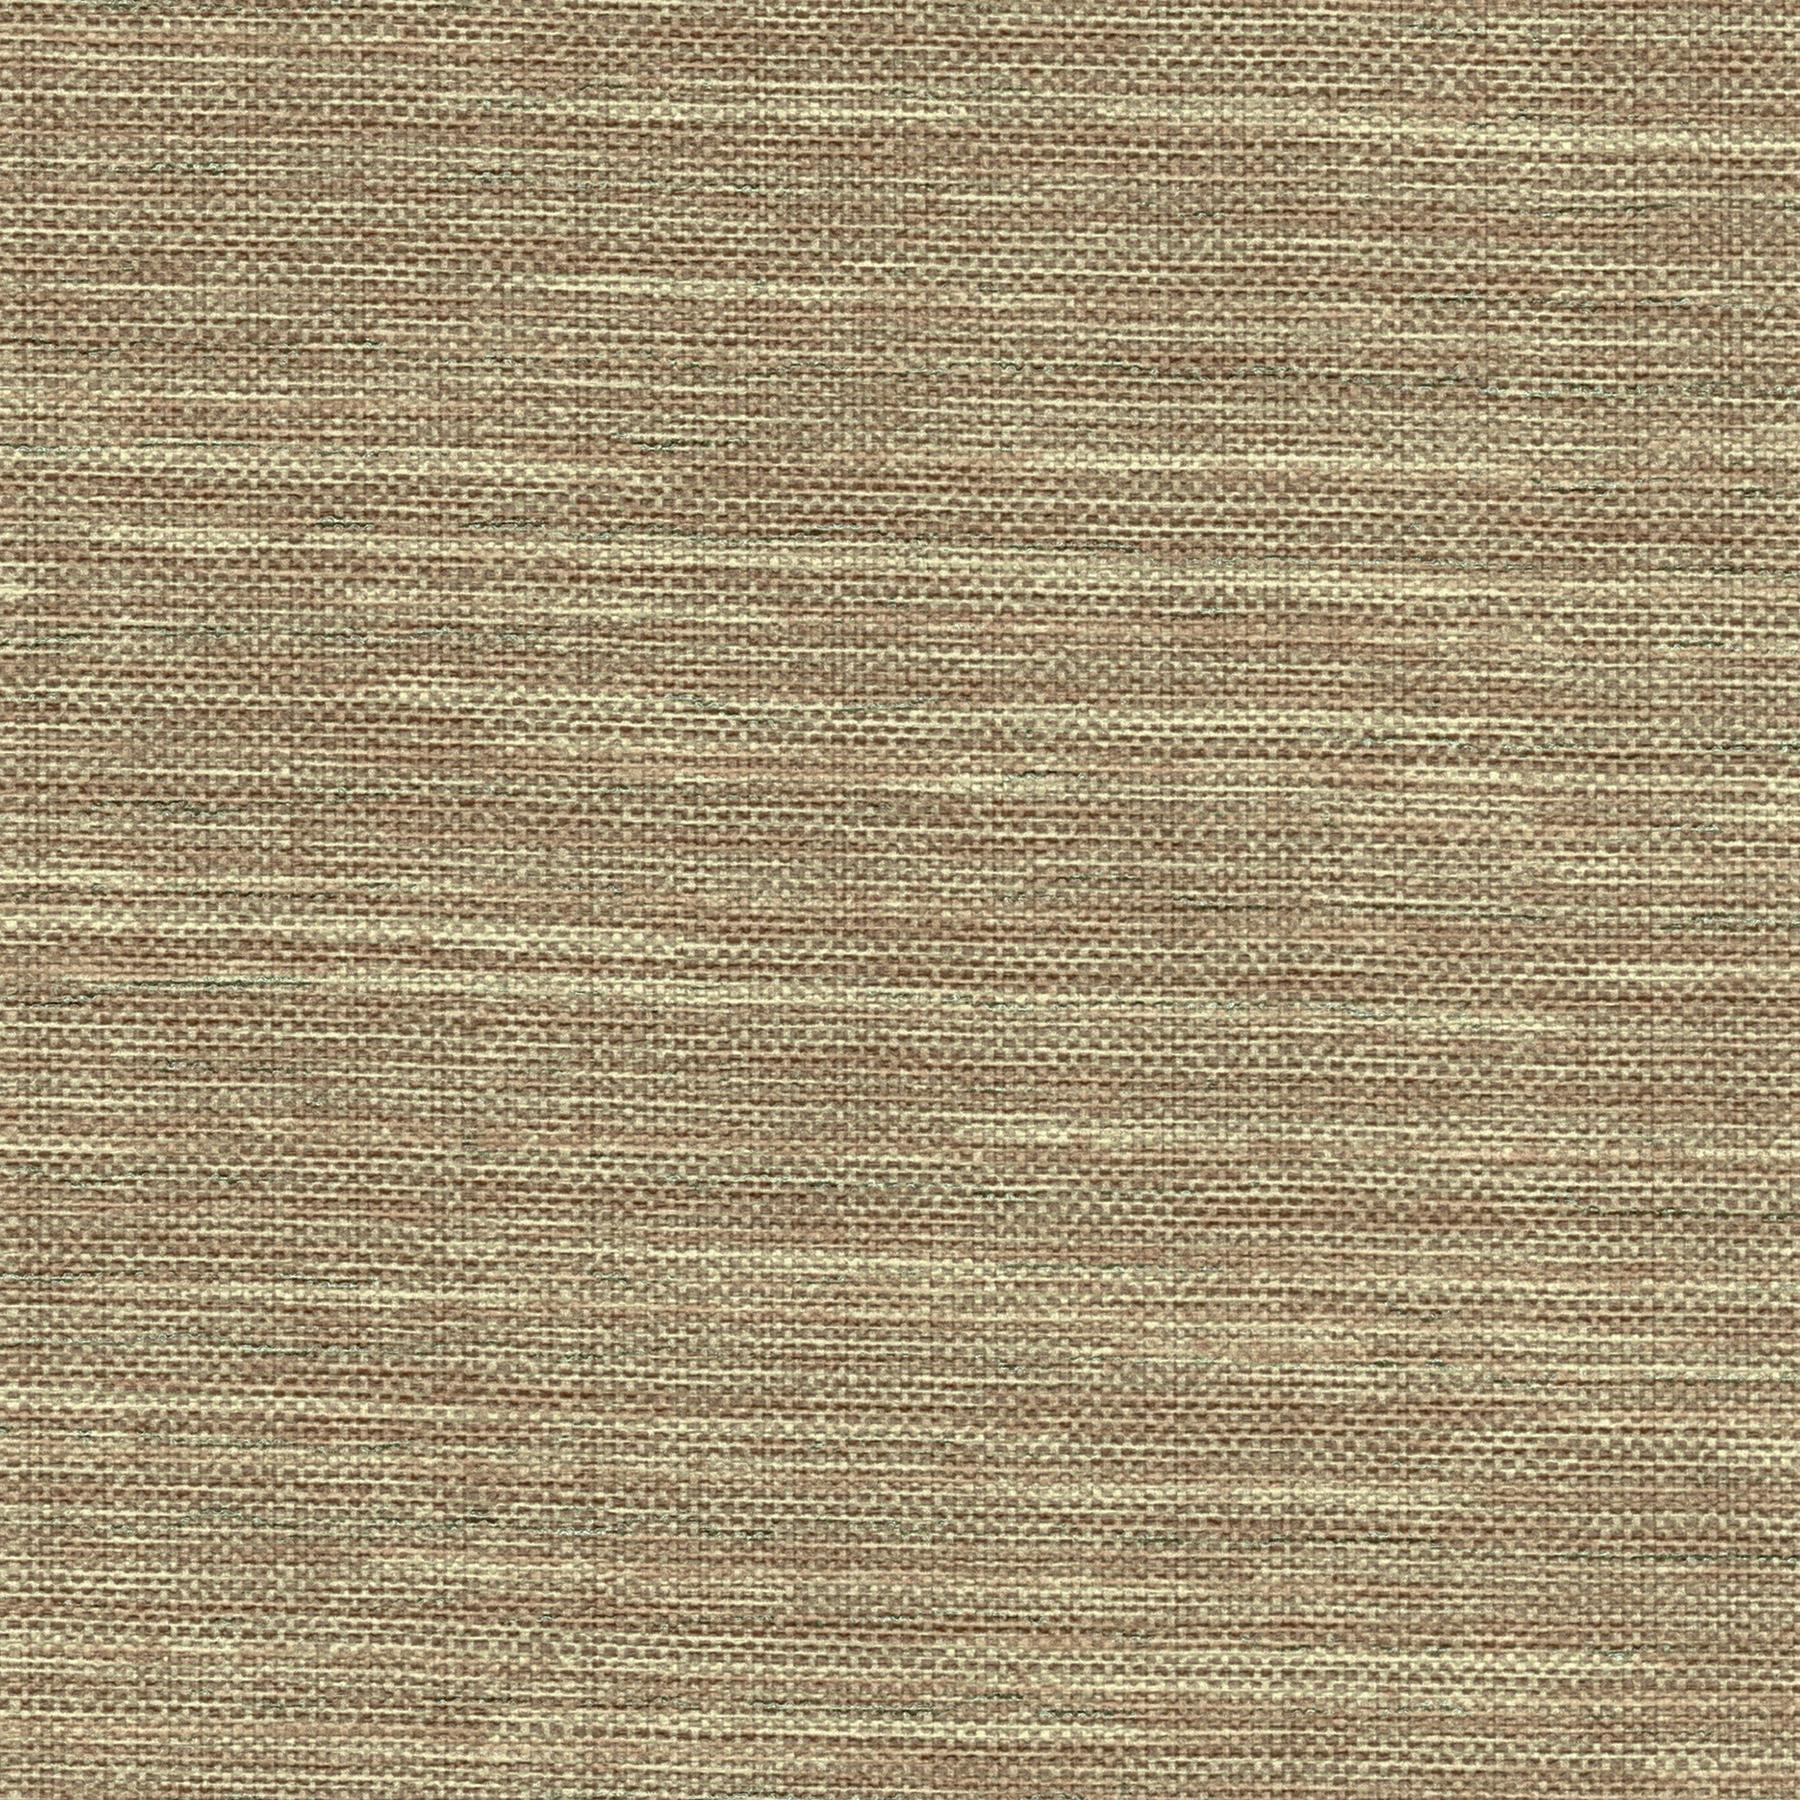 Picture of Bay Ridge Chestnut Linen Texture Wallpaper